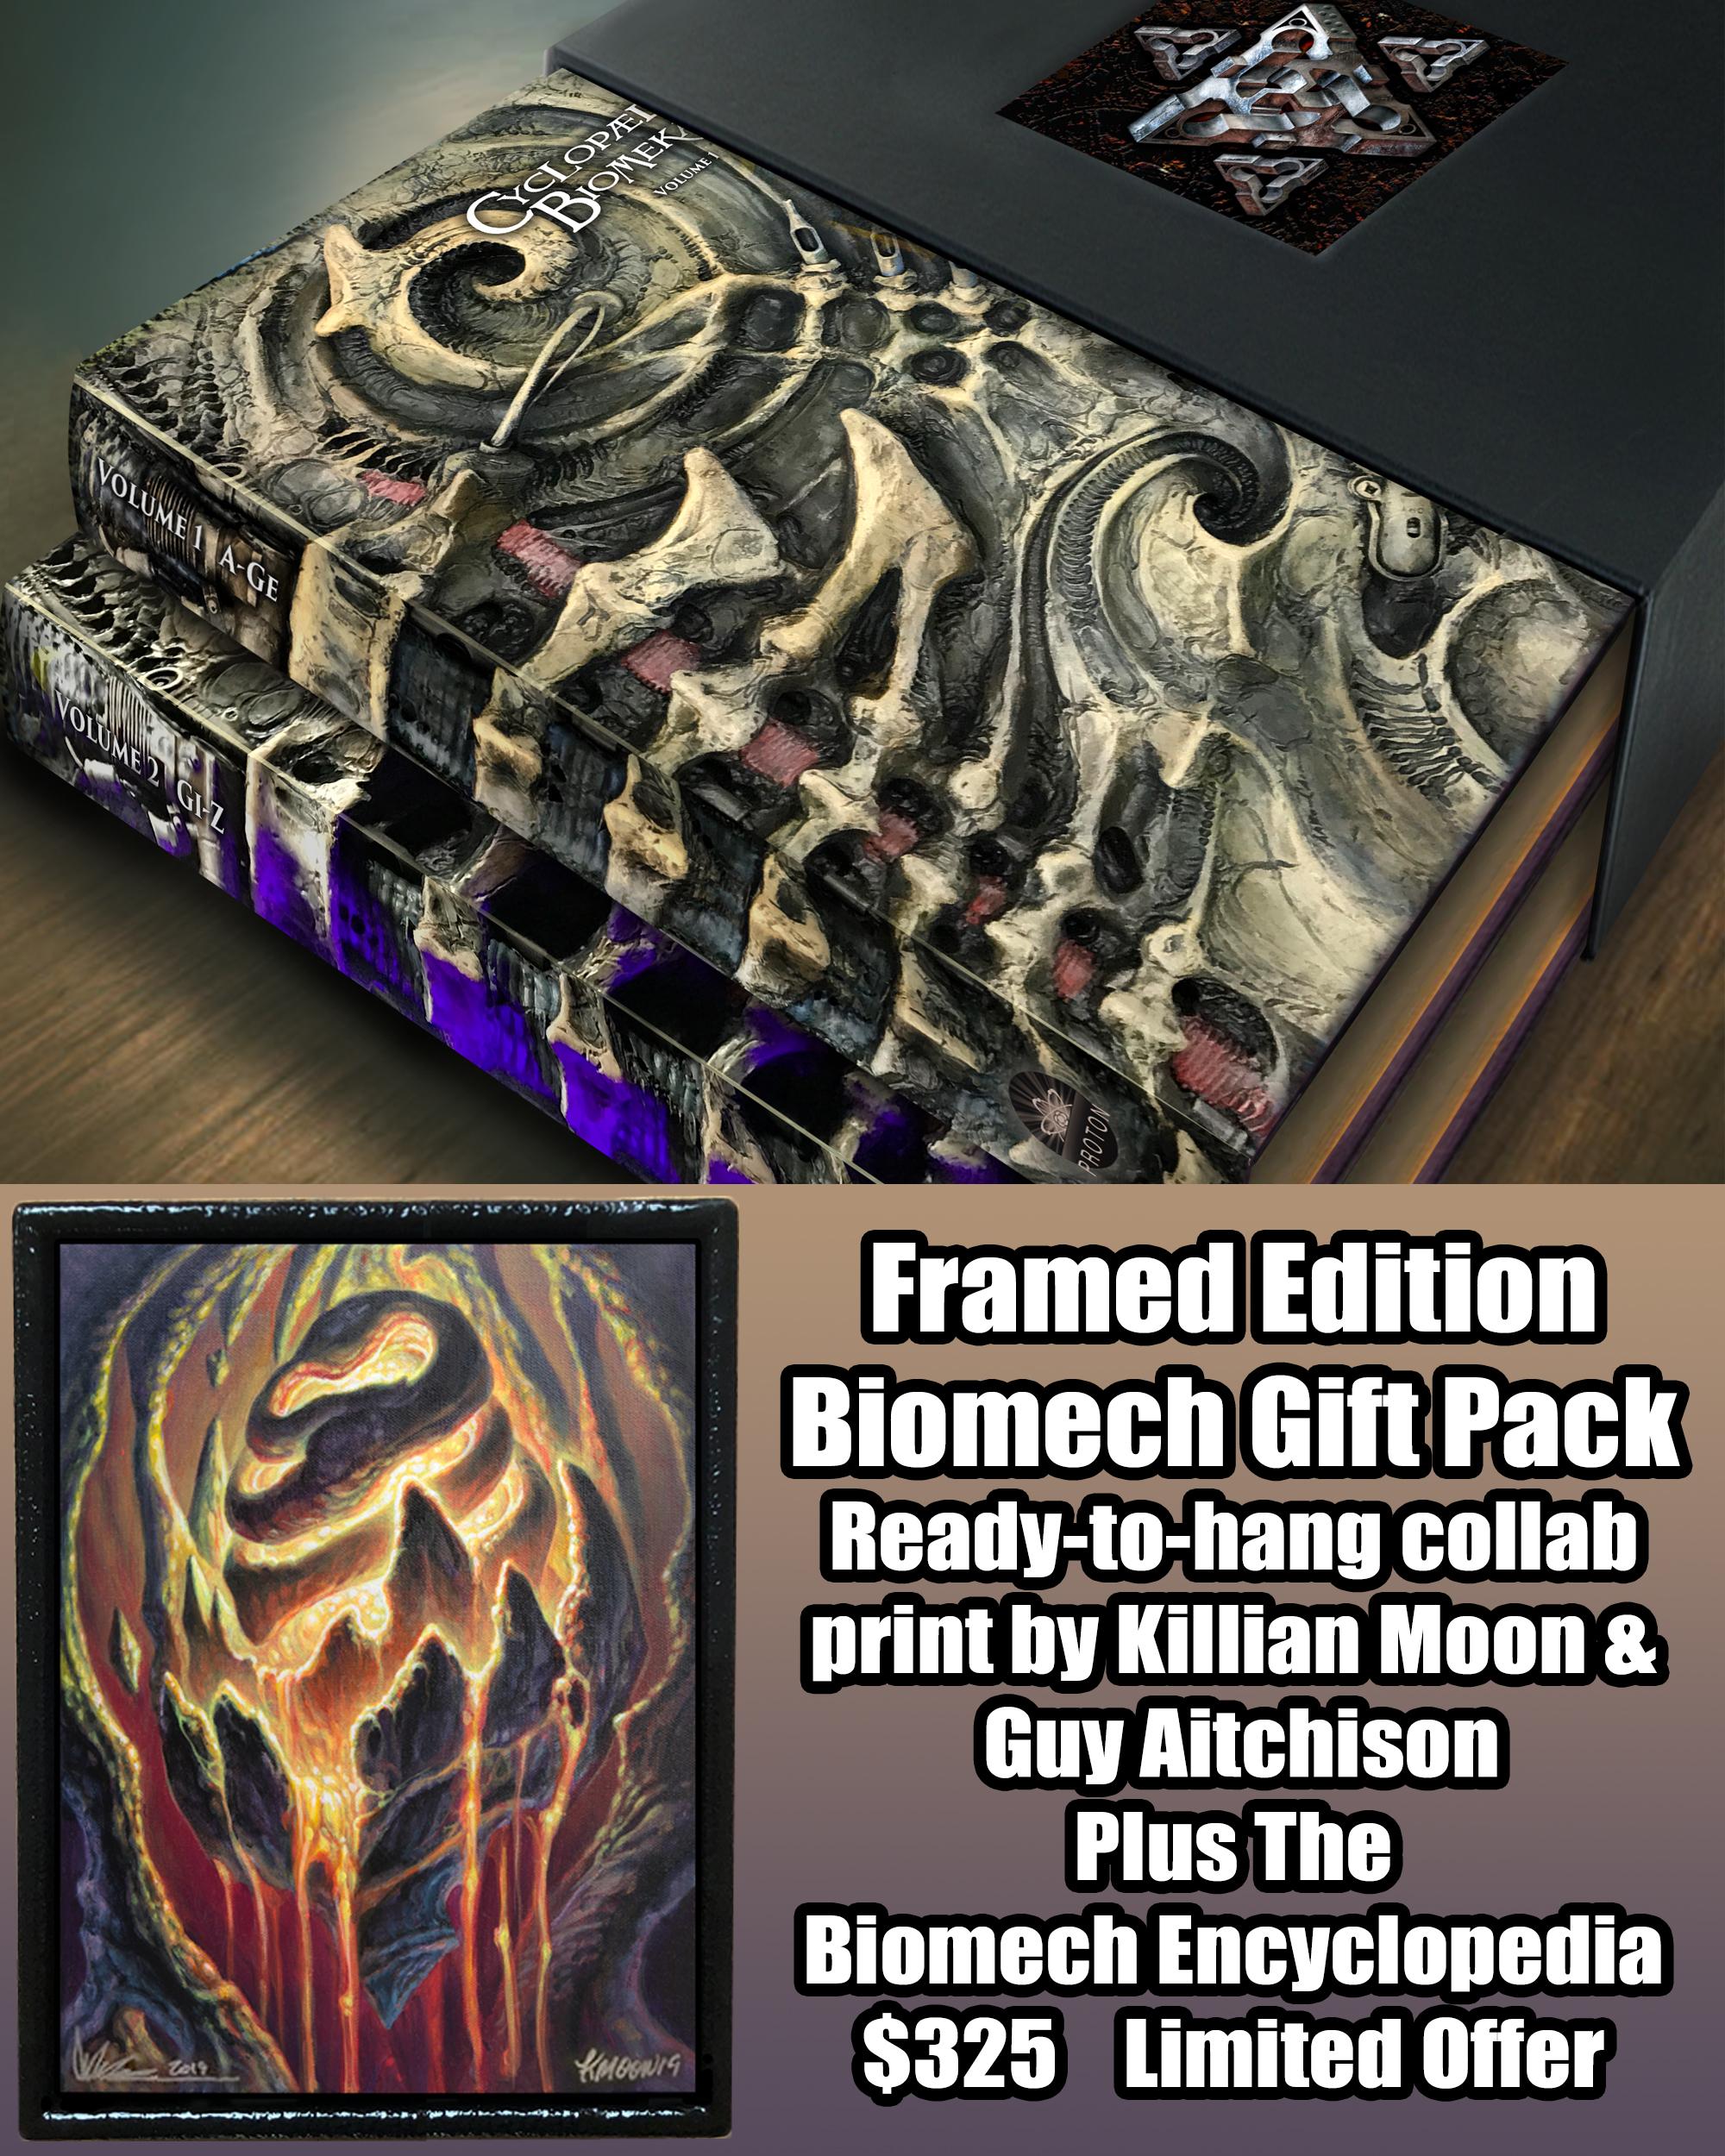 The Biomech Encyclopedia/Framed Print